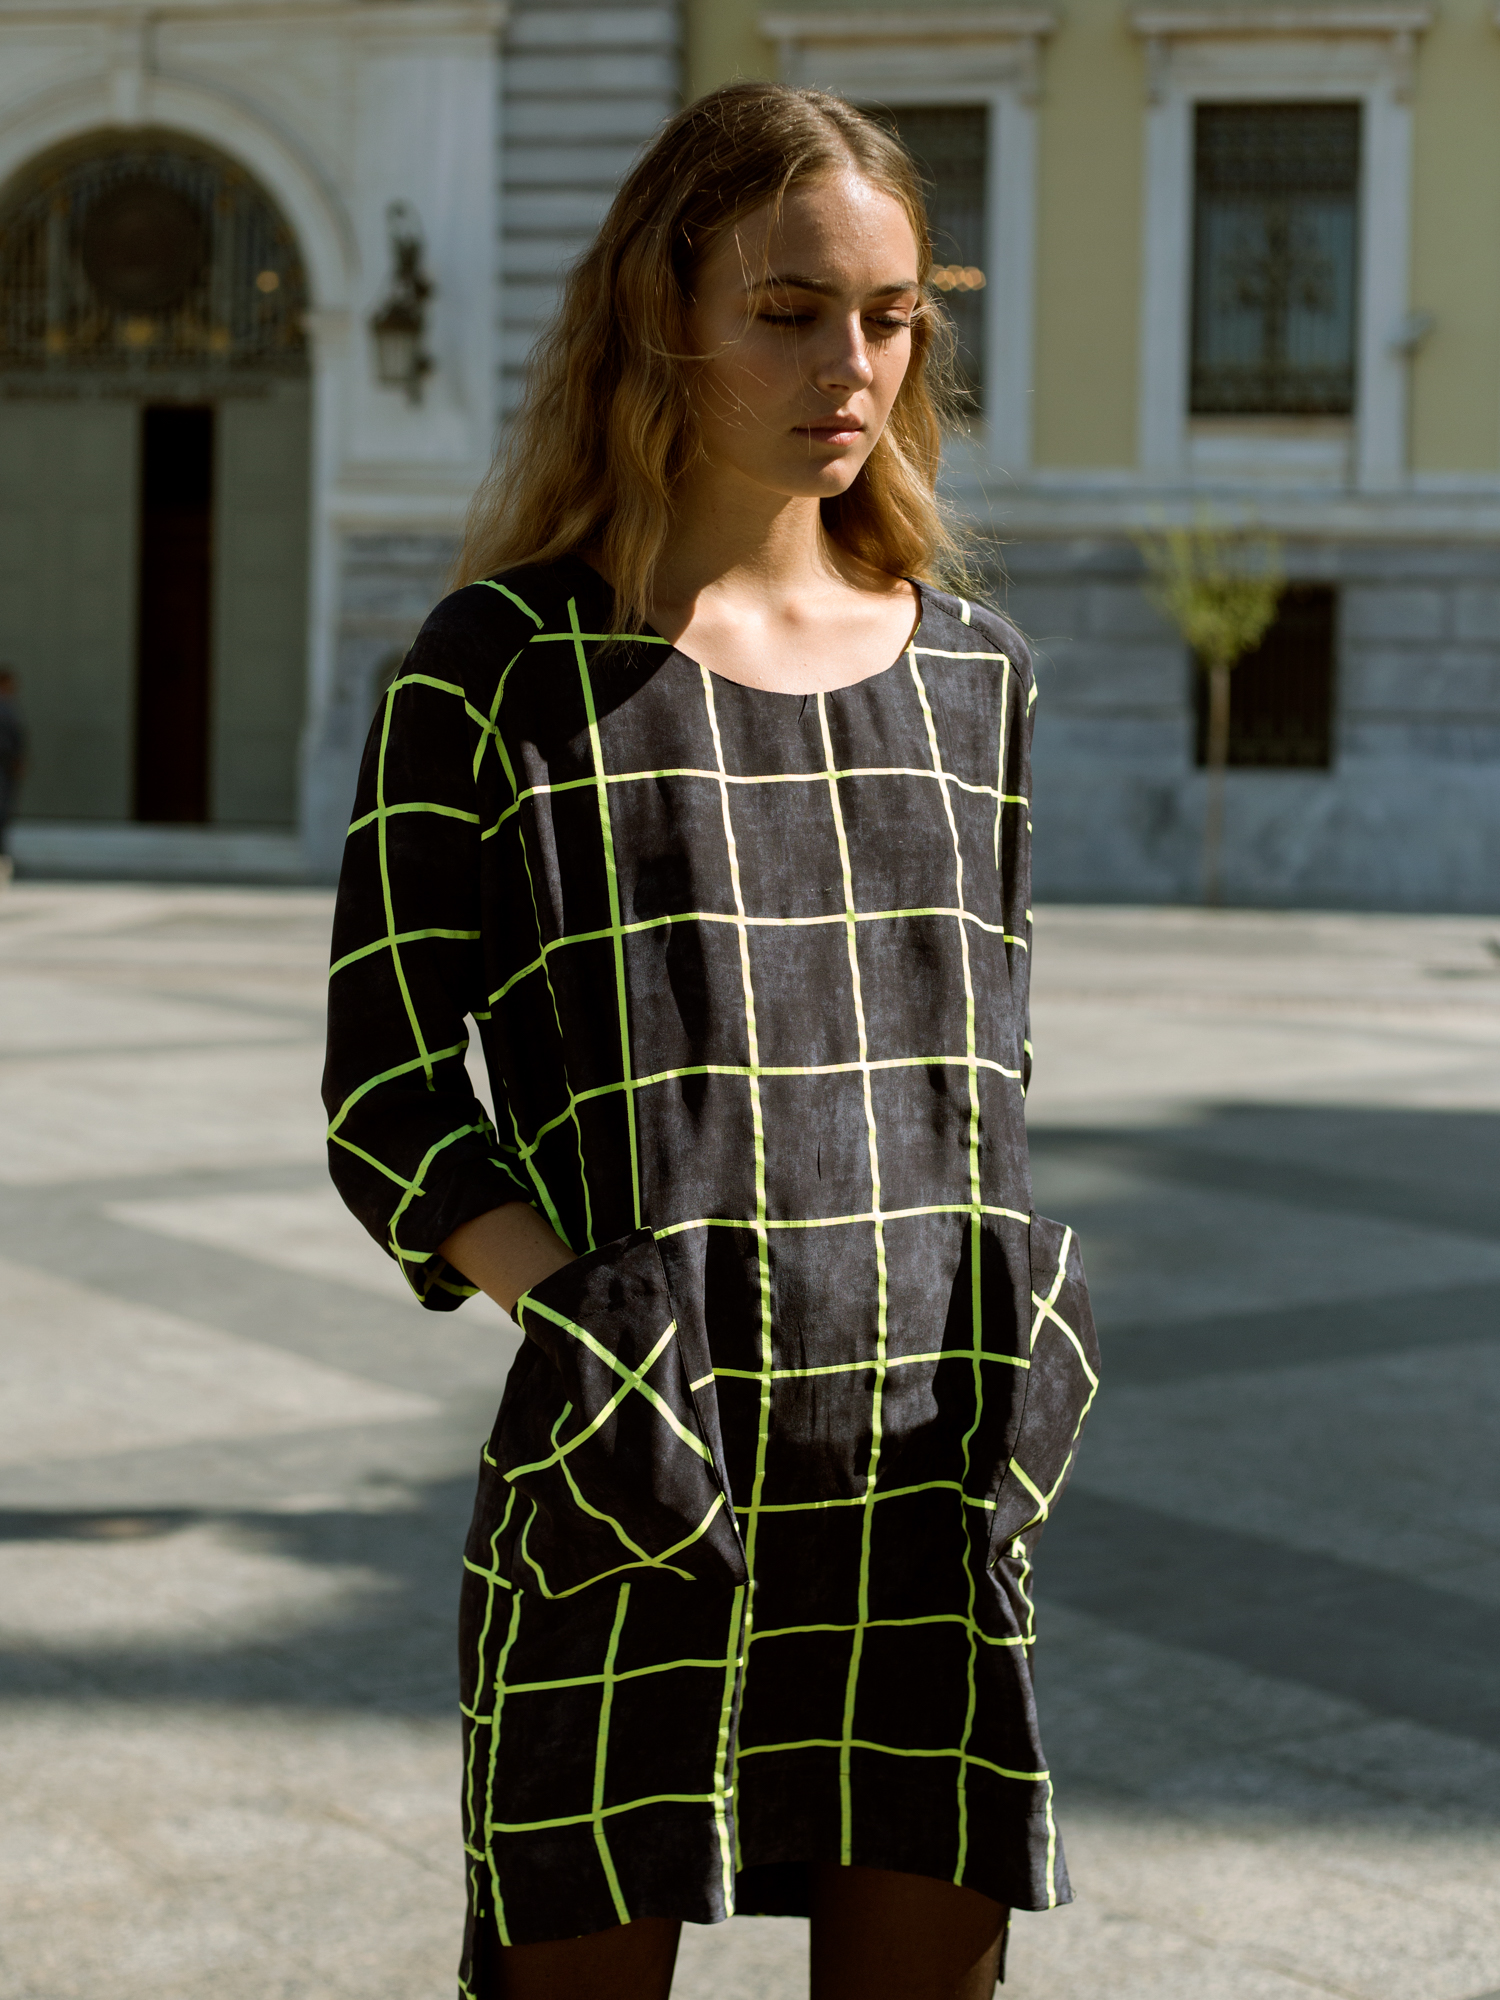 Cocoandsilk: Μιλήσαμε με τη δημιουργό του πιο σοφιστικέ, νέου, ελληνικού fashion brand